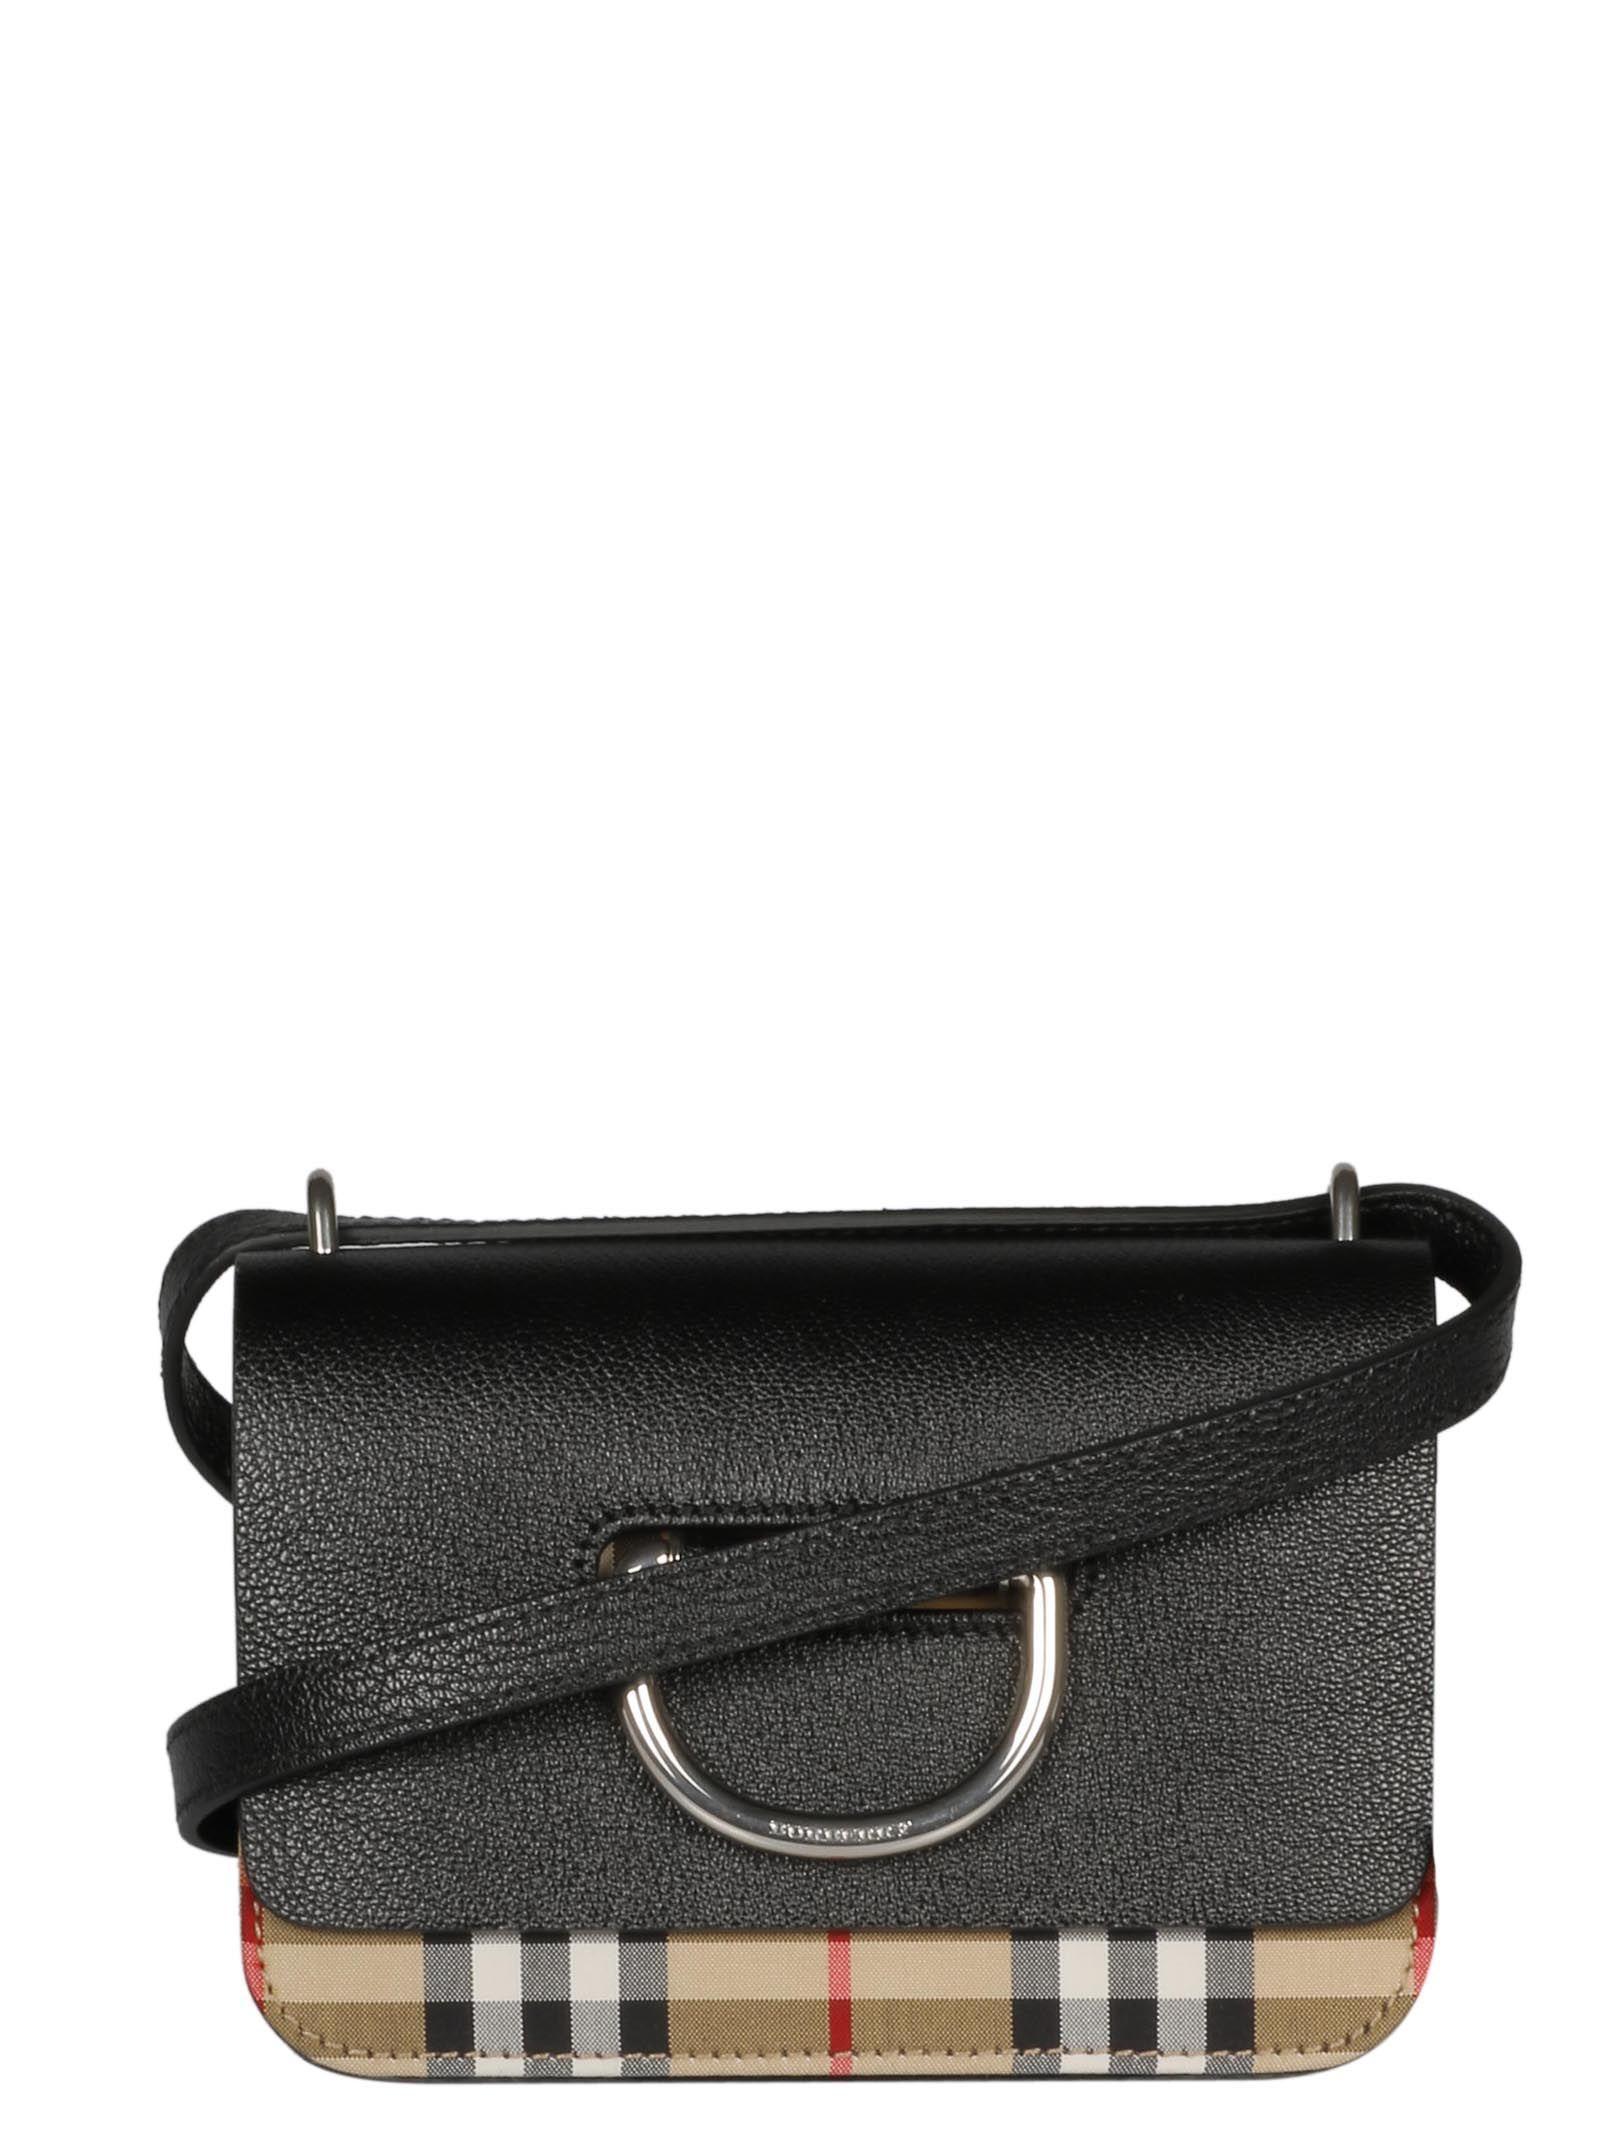 67472edc Burberry Mini Vintage Check Shoulder Bag In 00100 | ModeSens